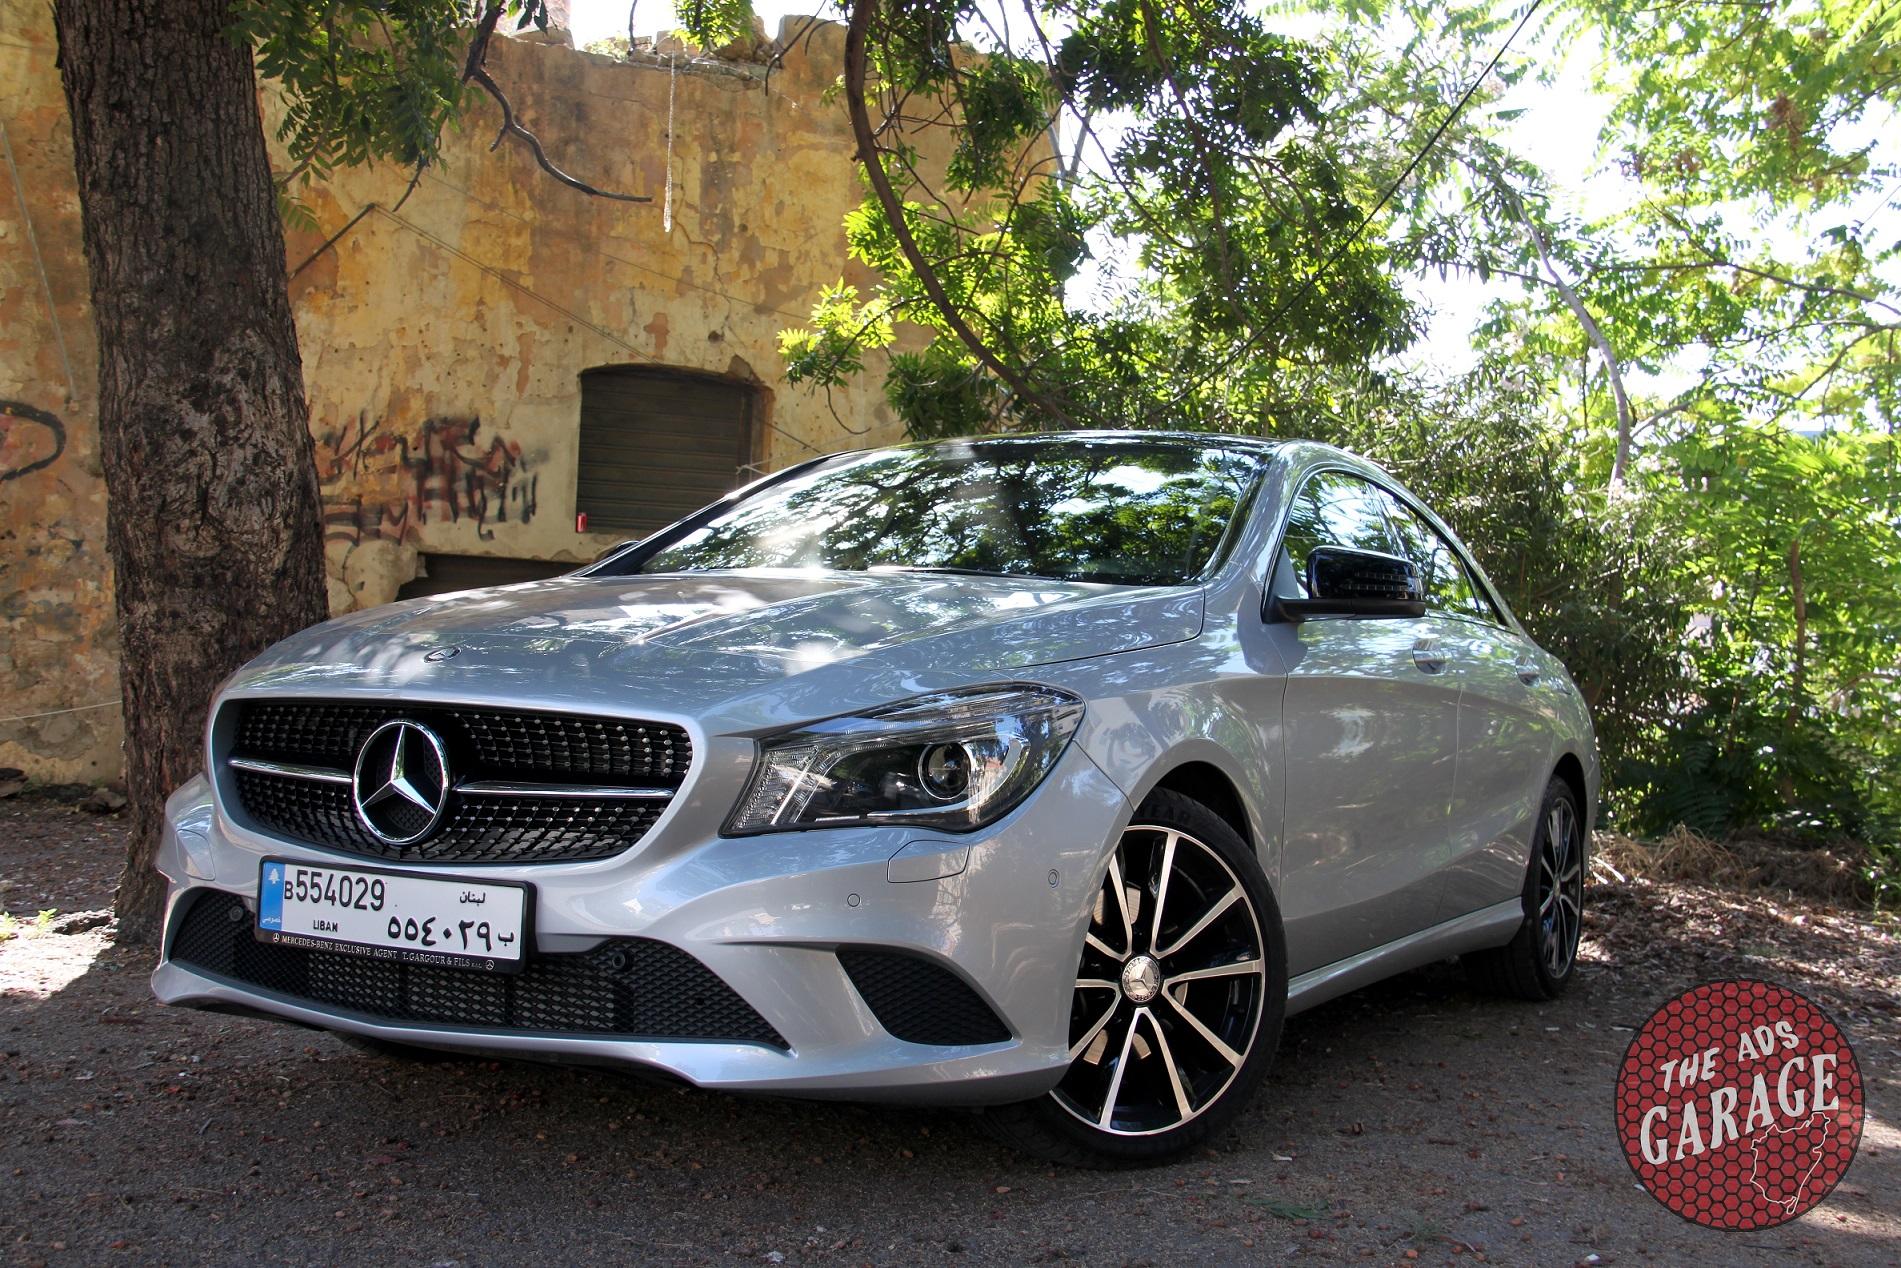 Test drives lebanon theadsgarage for Mercedes benz lebanon